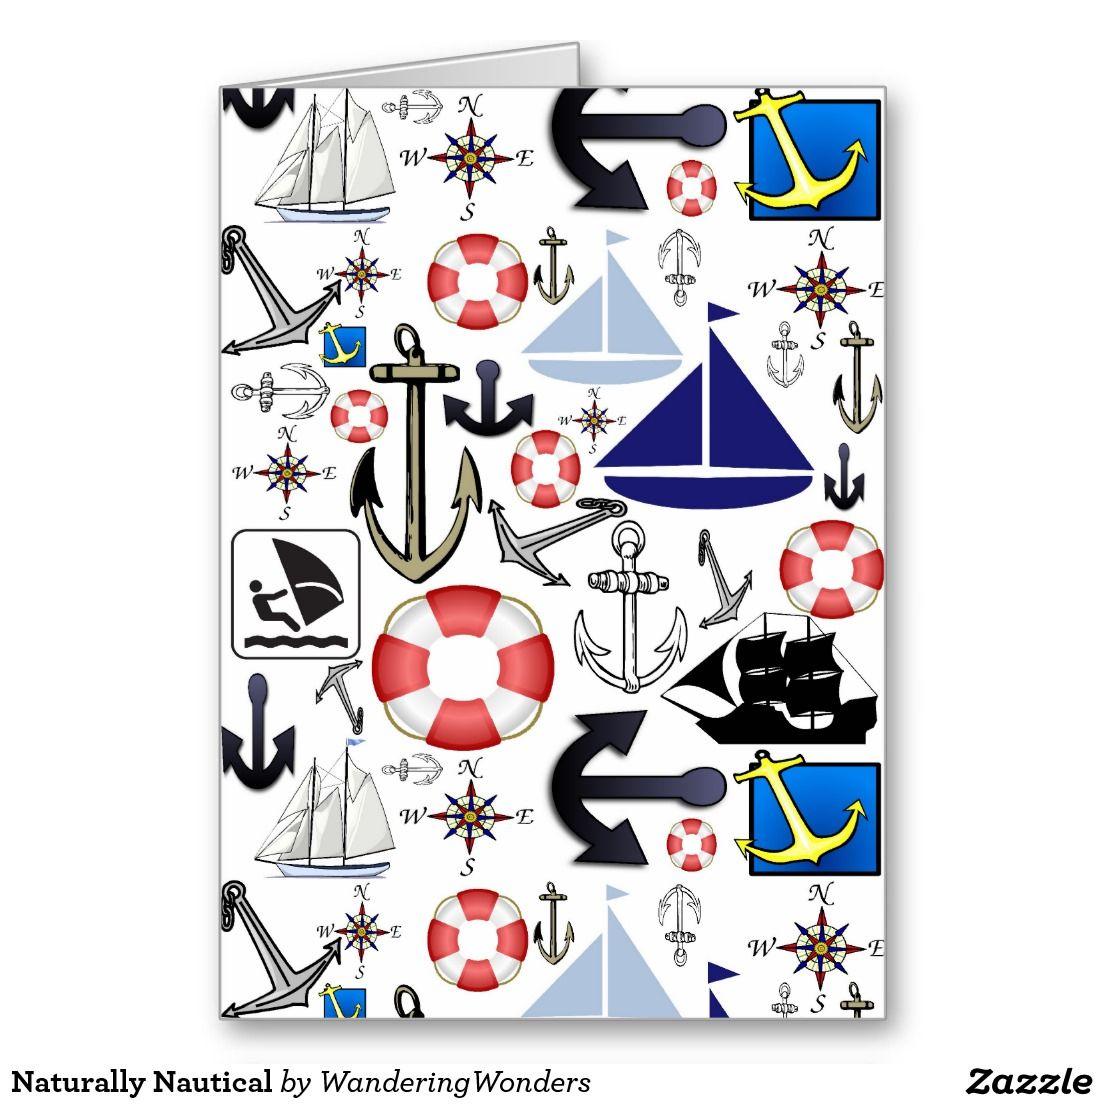 Naturally Nautical Greeting Cards (x3)